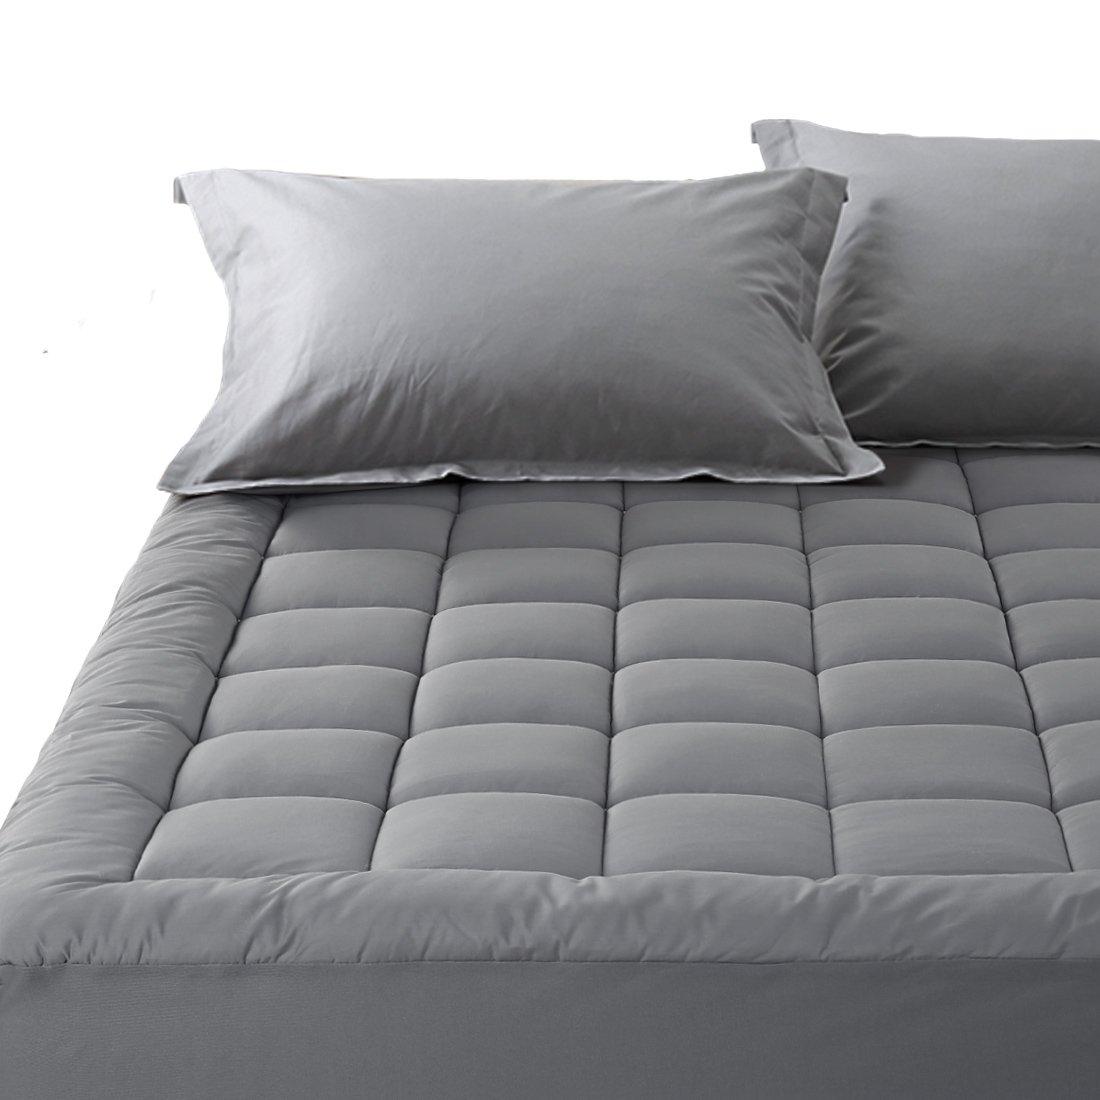 Balichun Pillowtop Mattress Pad Cover 300TC Cotton Down Alternative Filled Mattress Topper with 8-21-Inch Deep Pocket (Dark Gray, Twin XL)